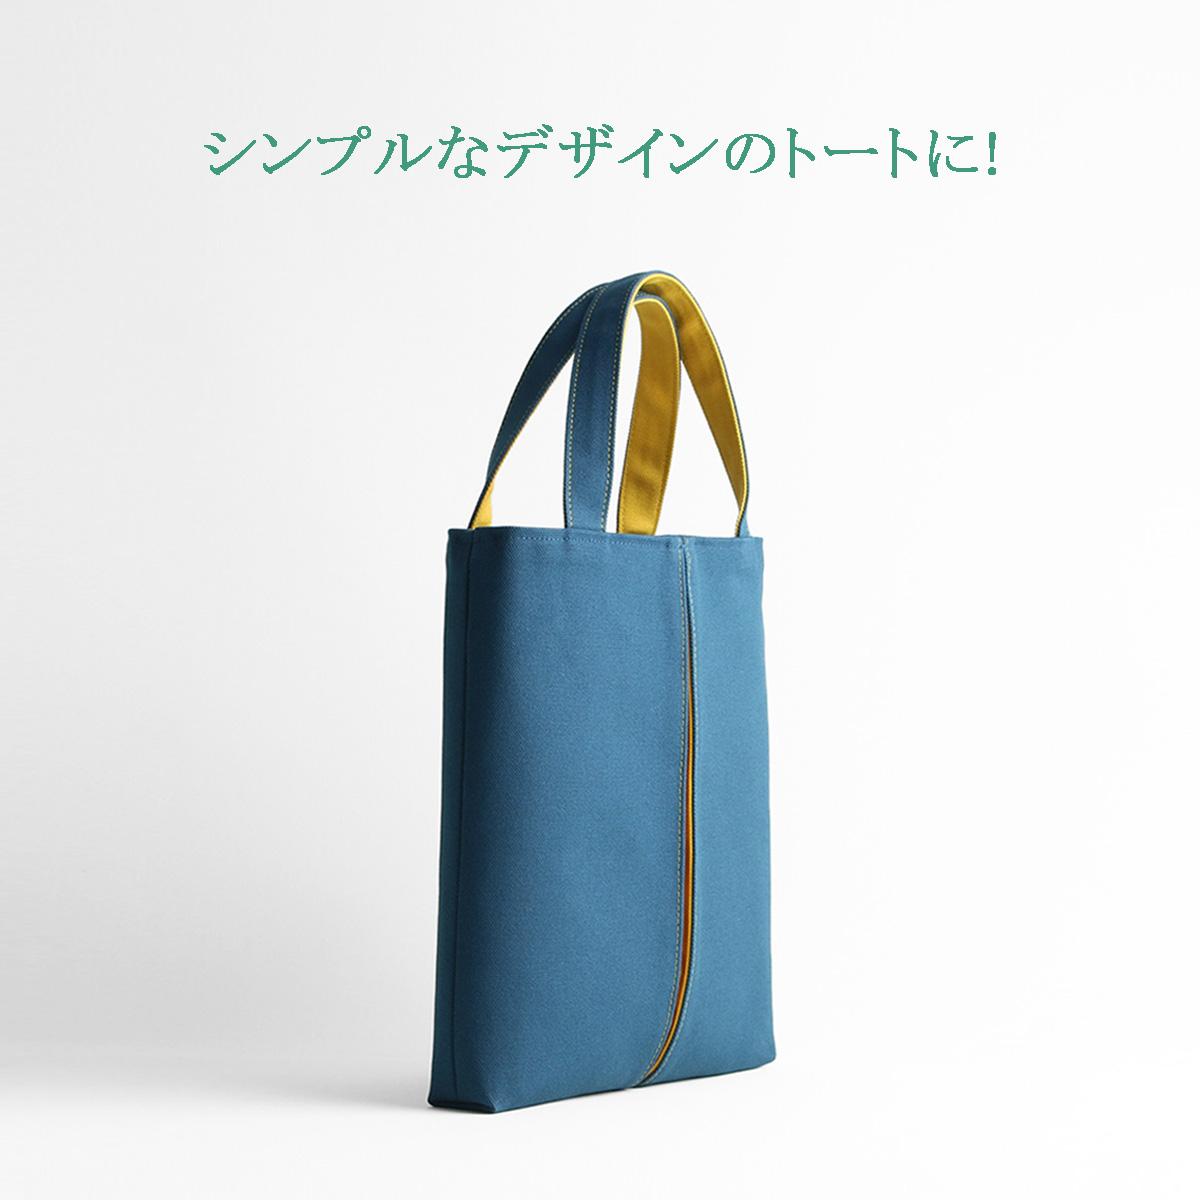 KOSHO ougi pleats 帆布 トートバッグ S